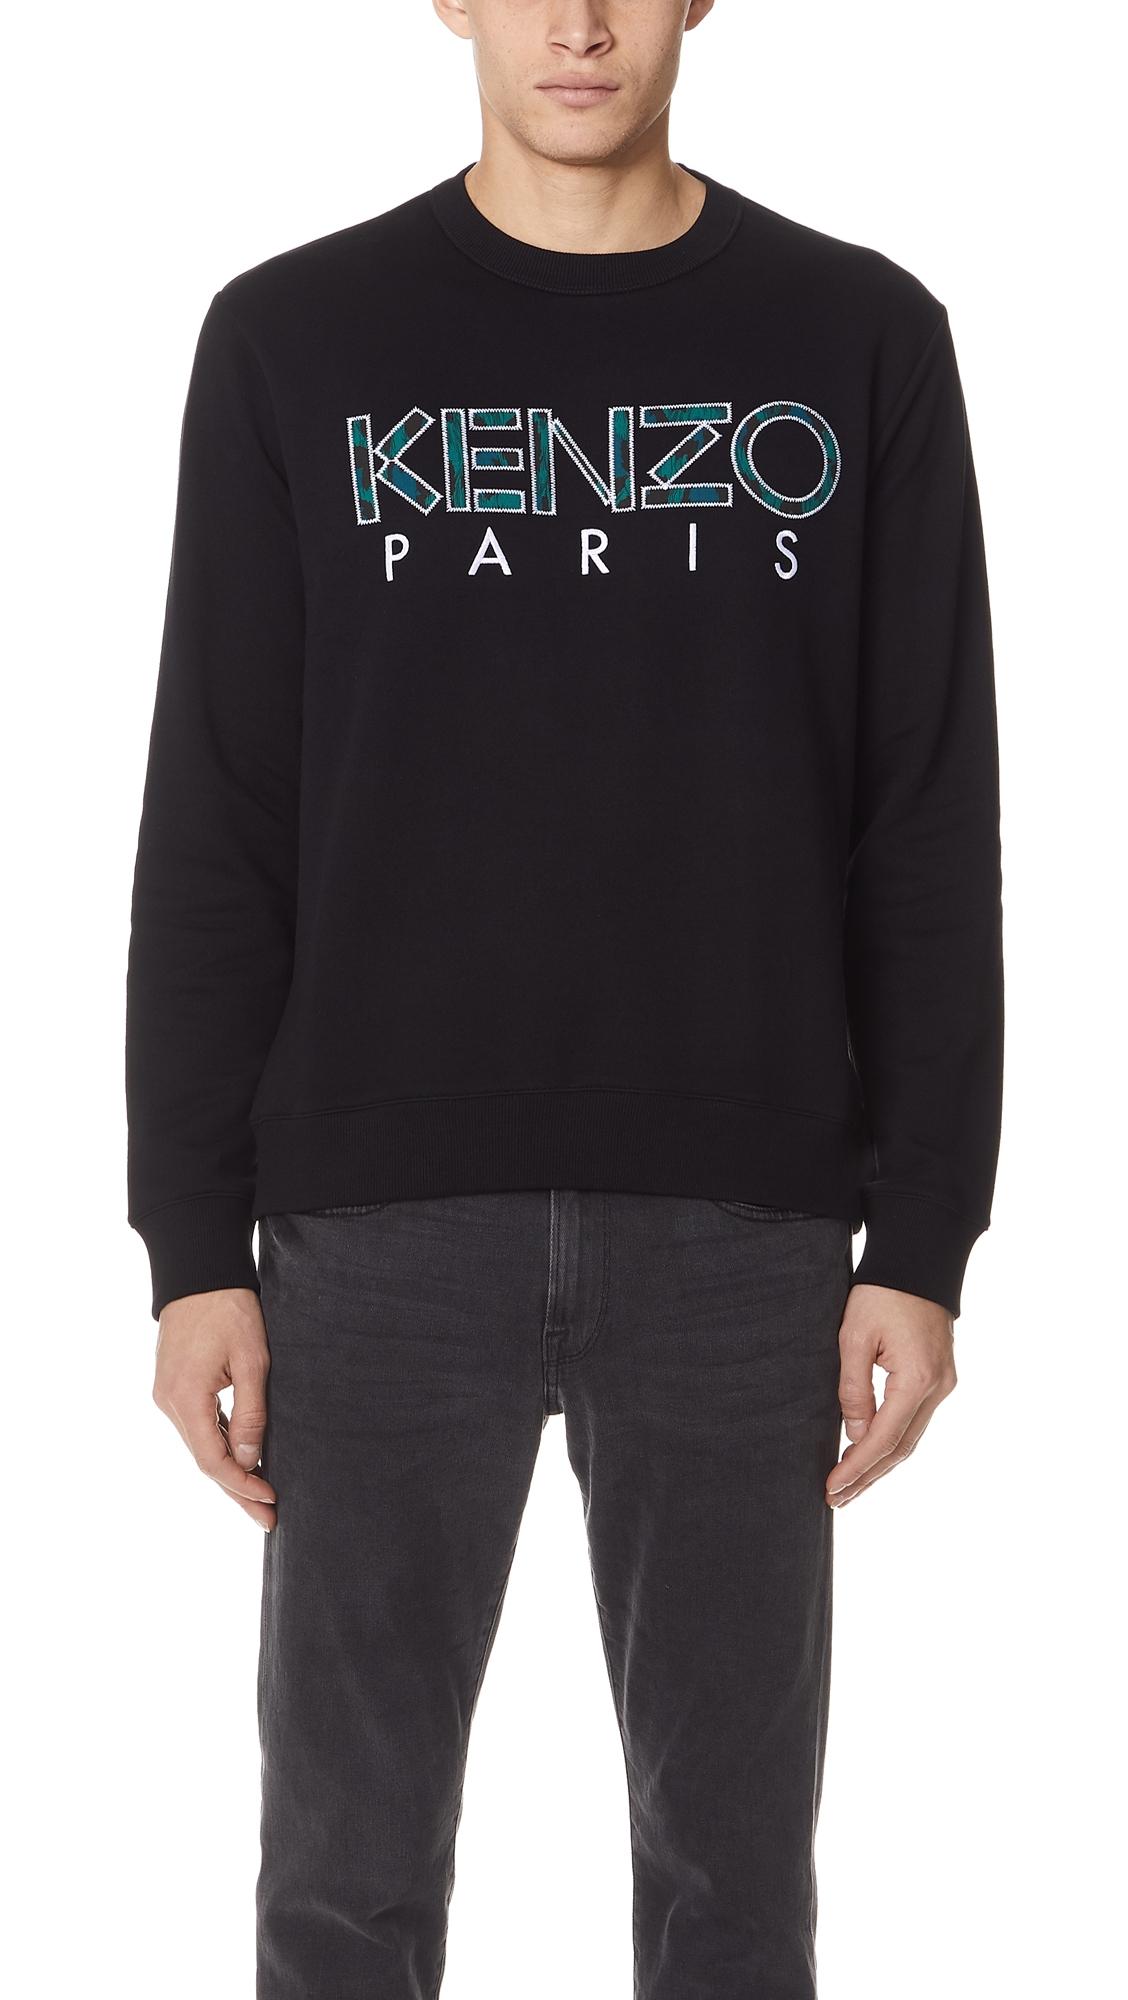 KENZO Logo-Embroidered Cotton-Jersey Sweatshirt, Black